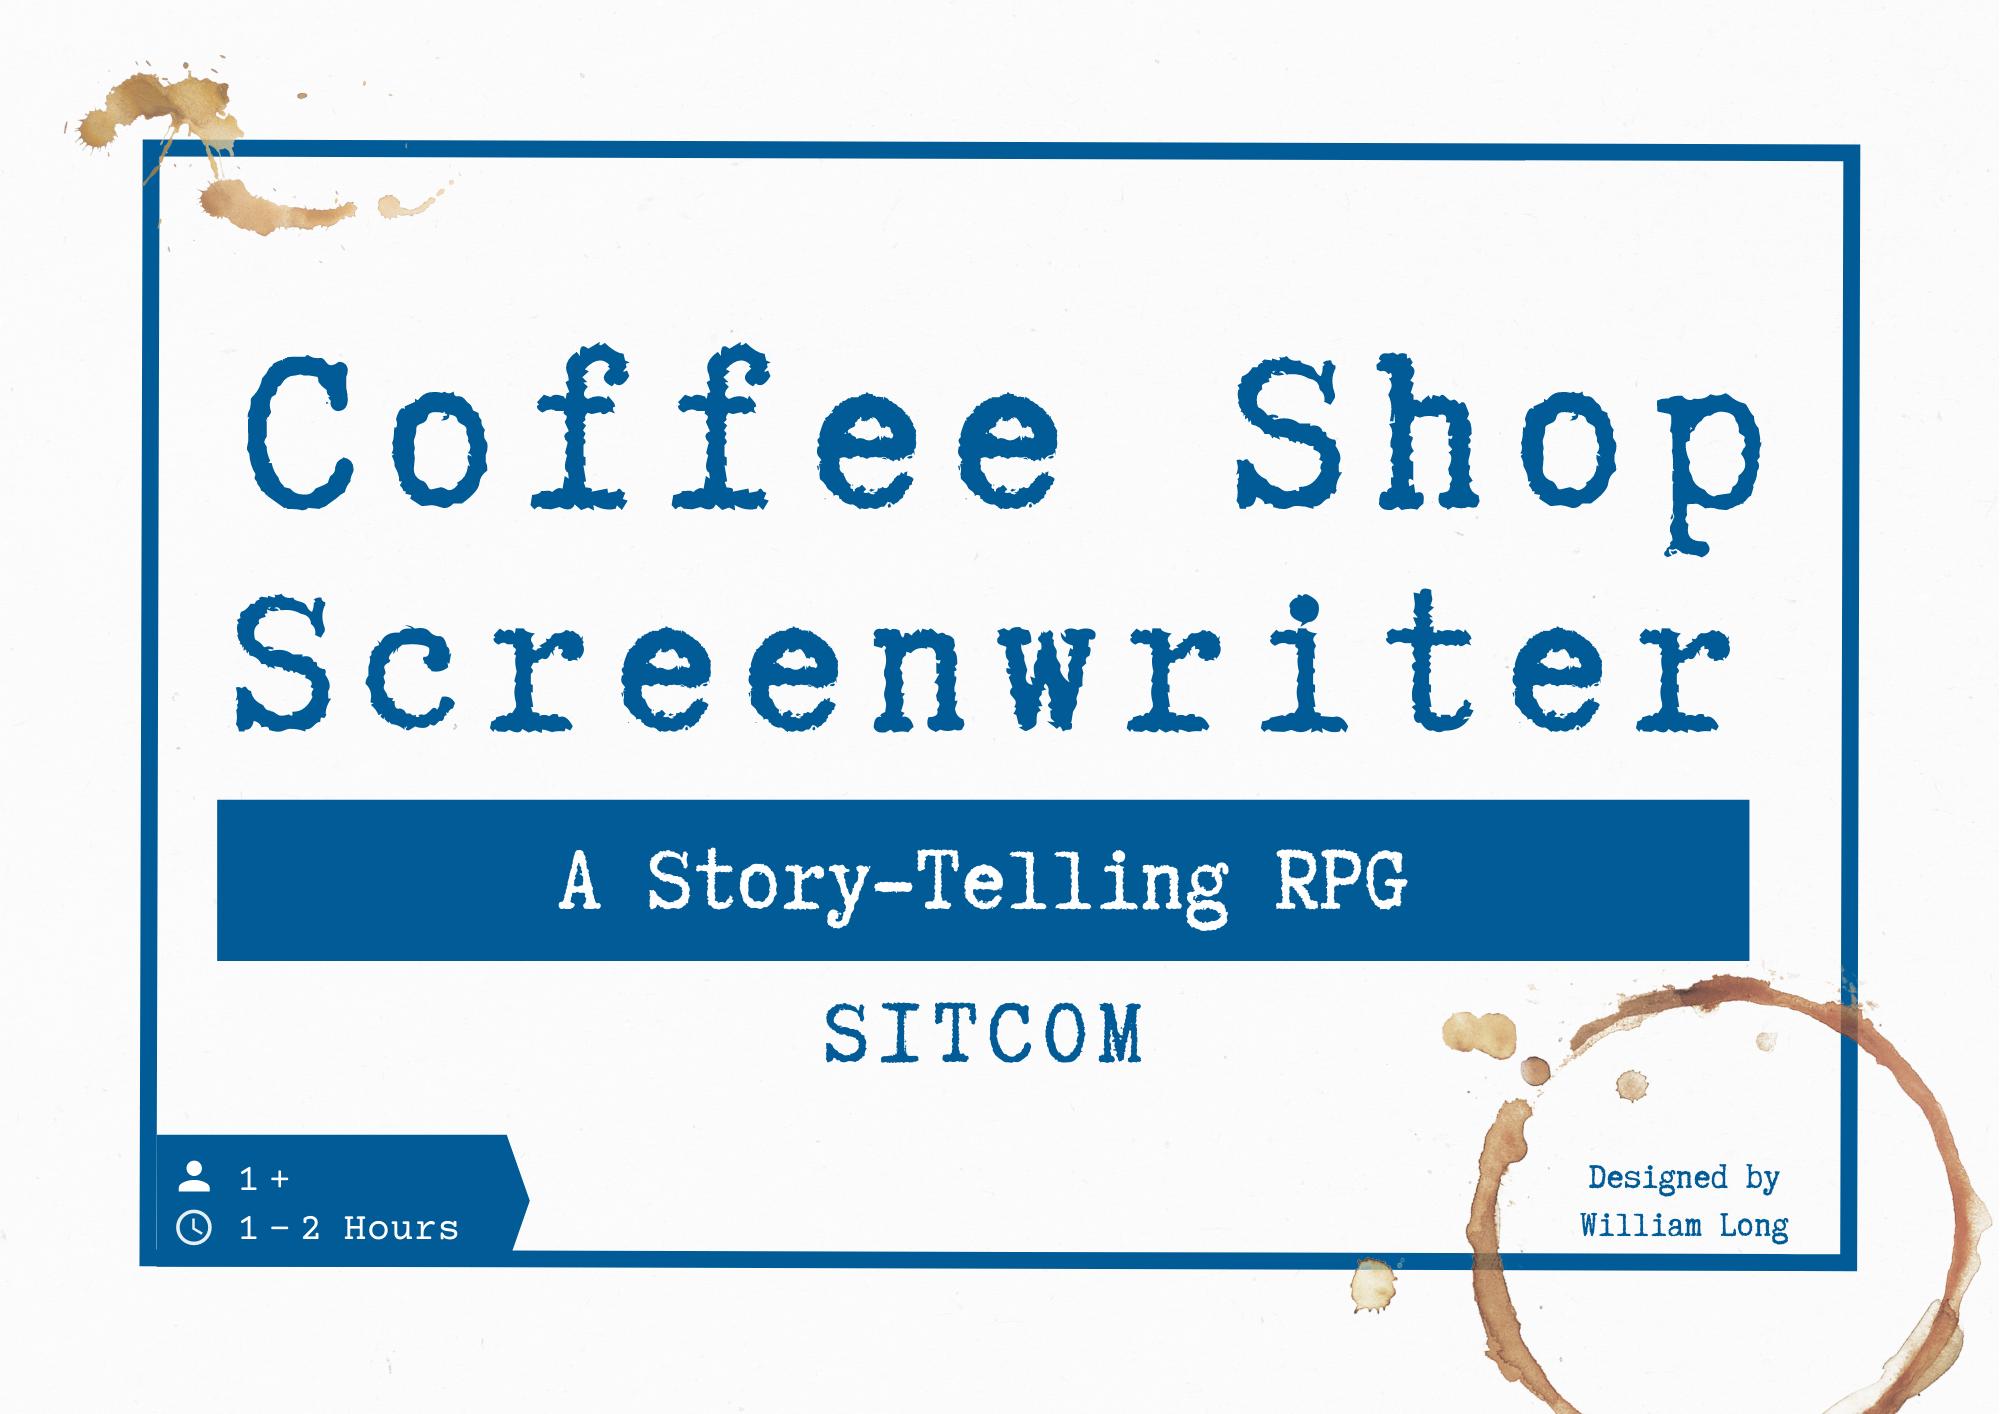 Coffee Shop Screenwriter - Sitcom